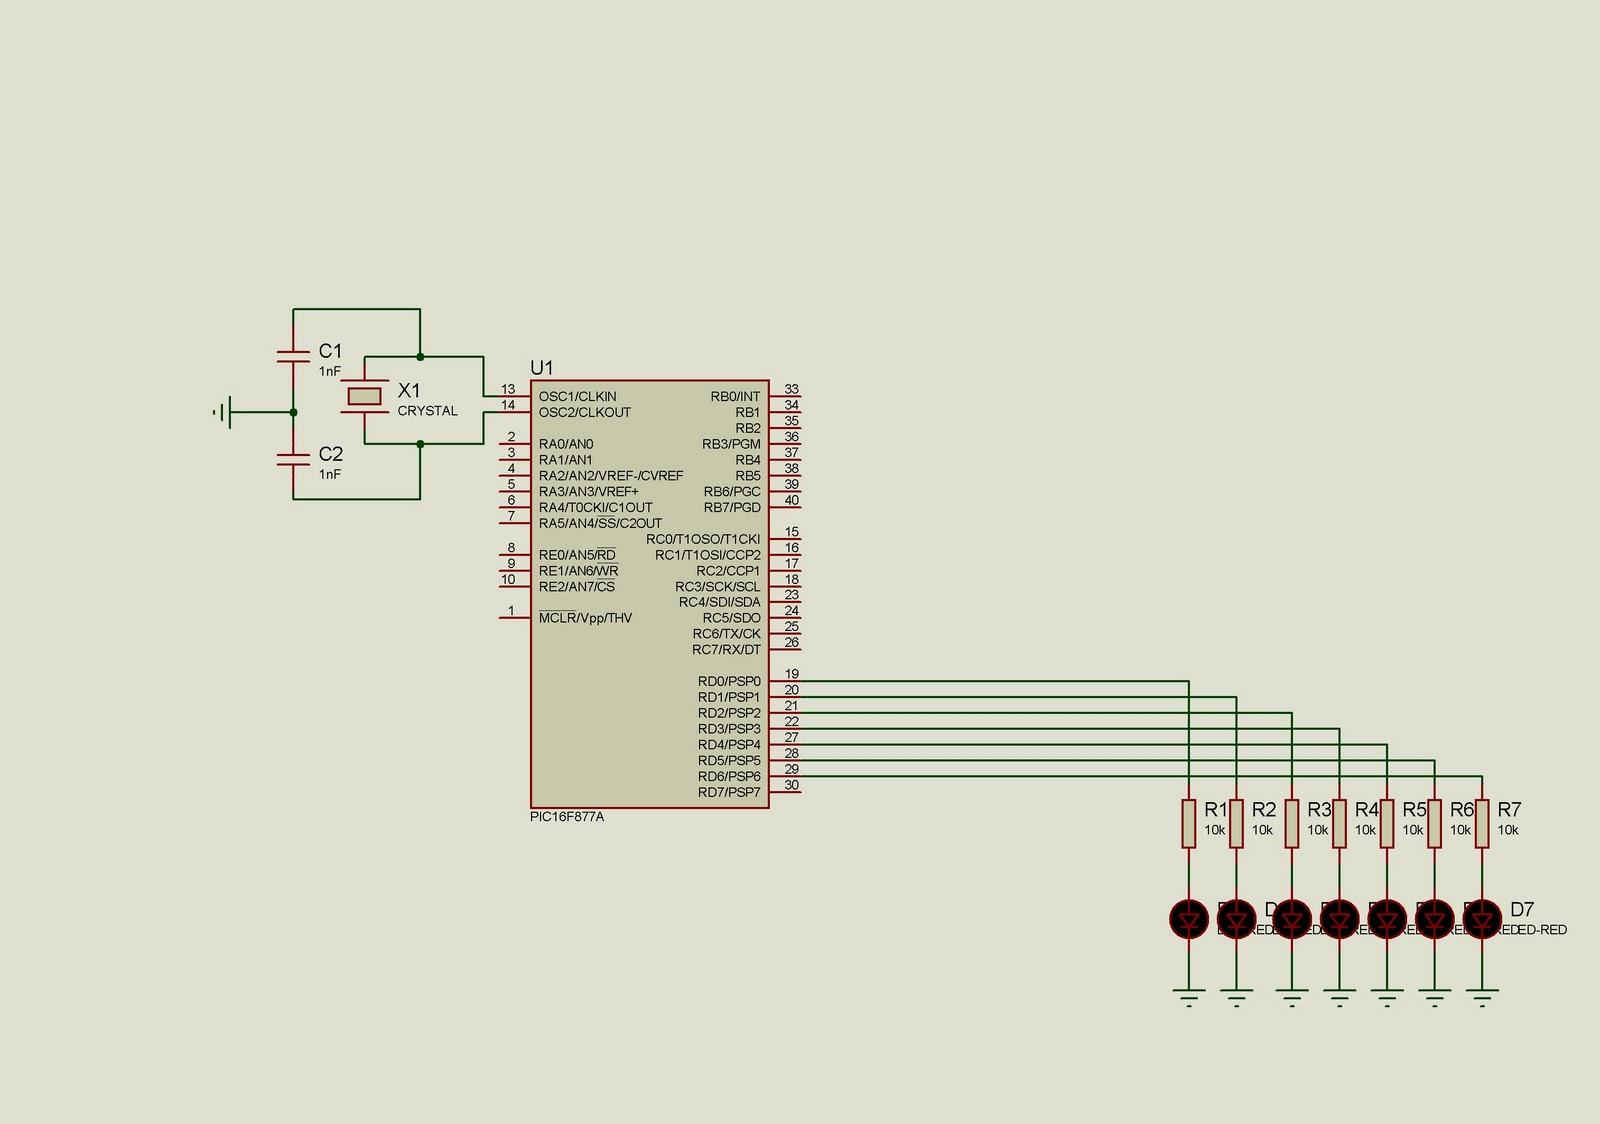 medium resolution of circuit for ring johnson counter